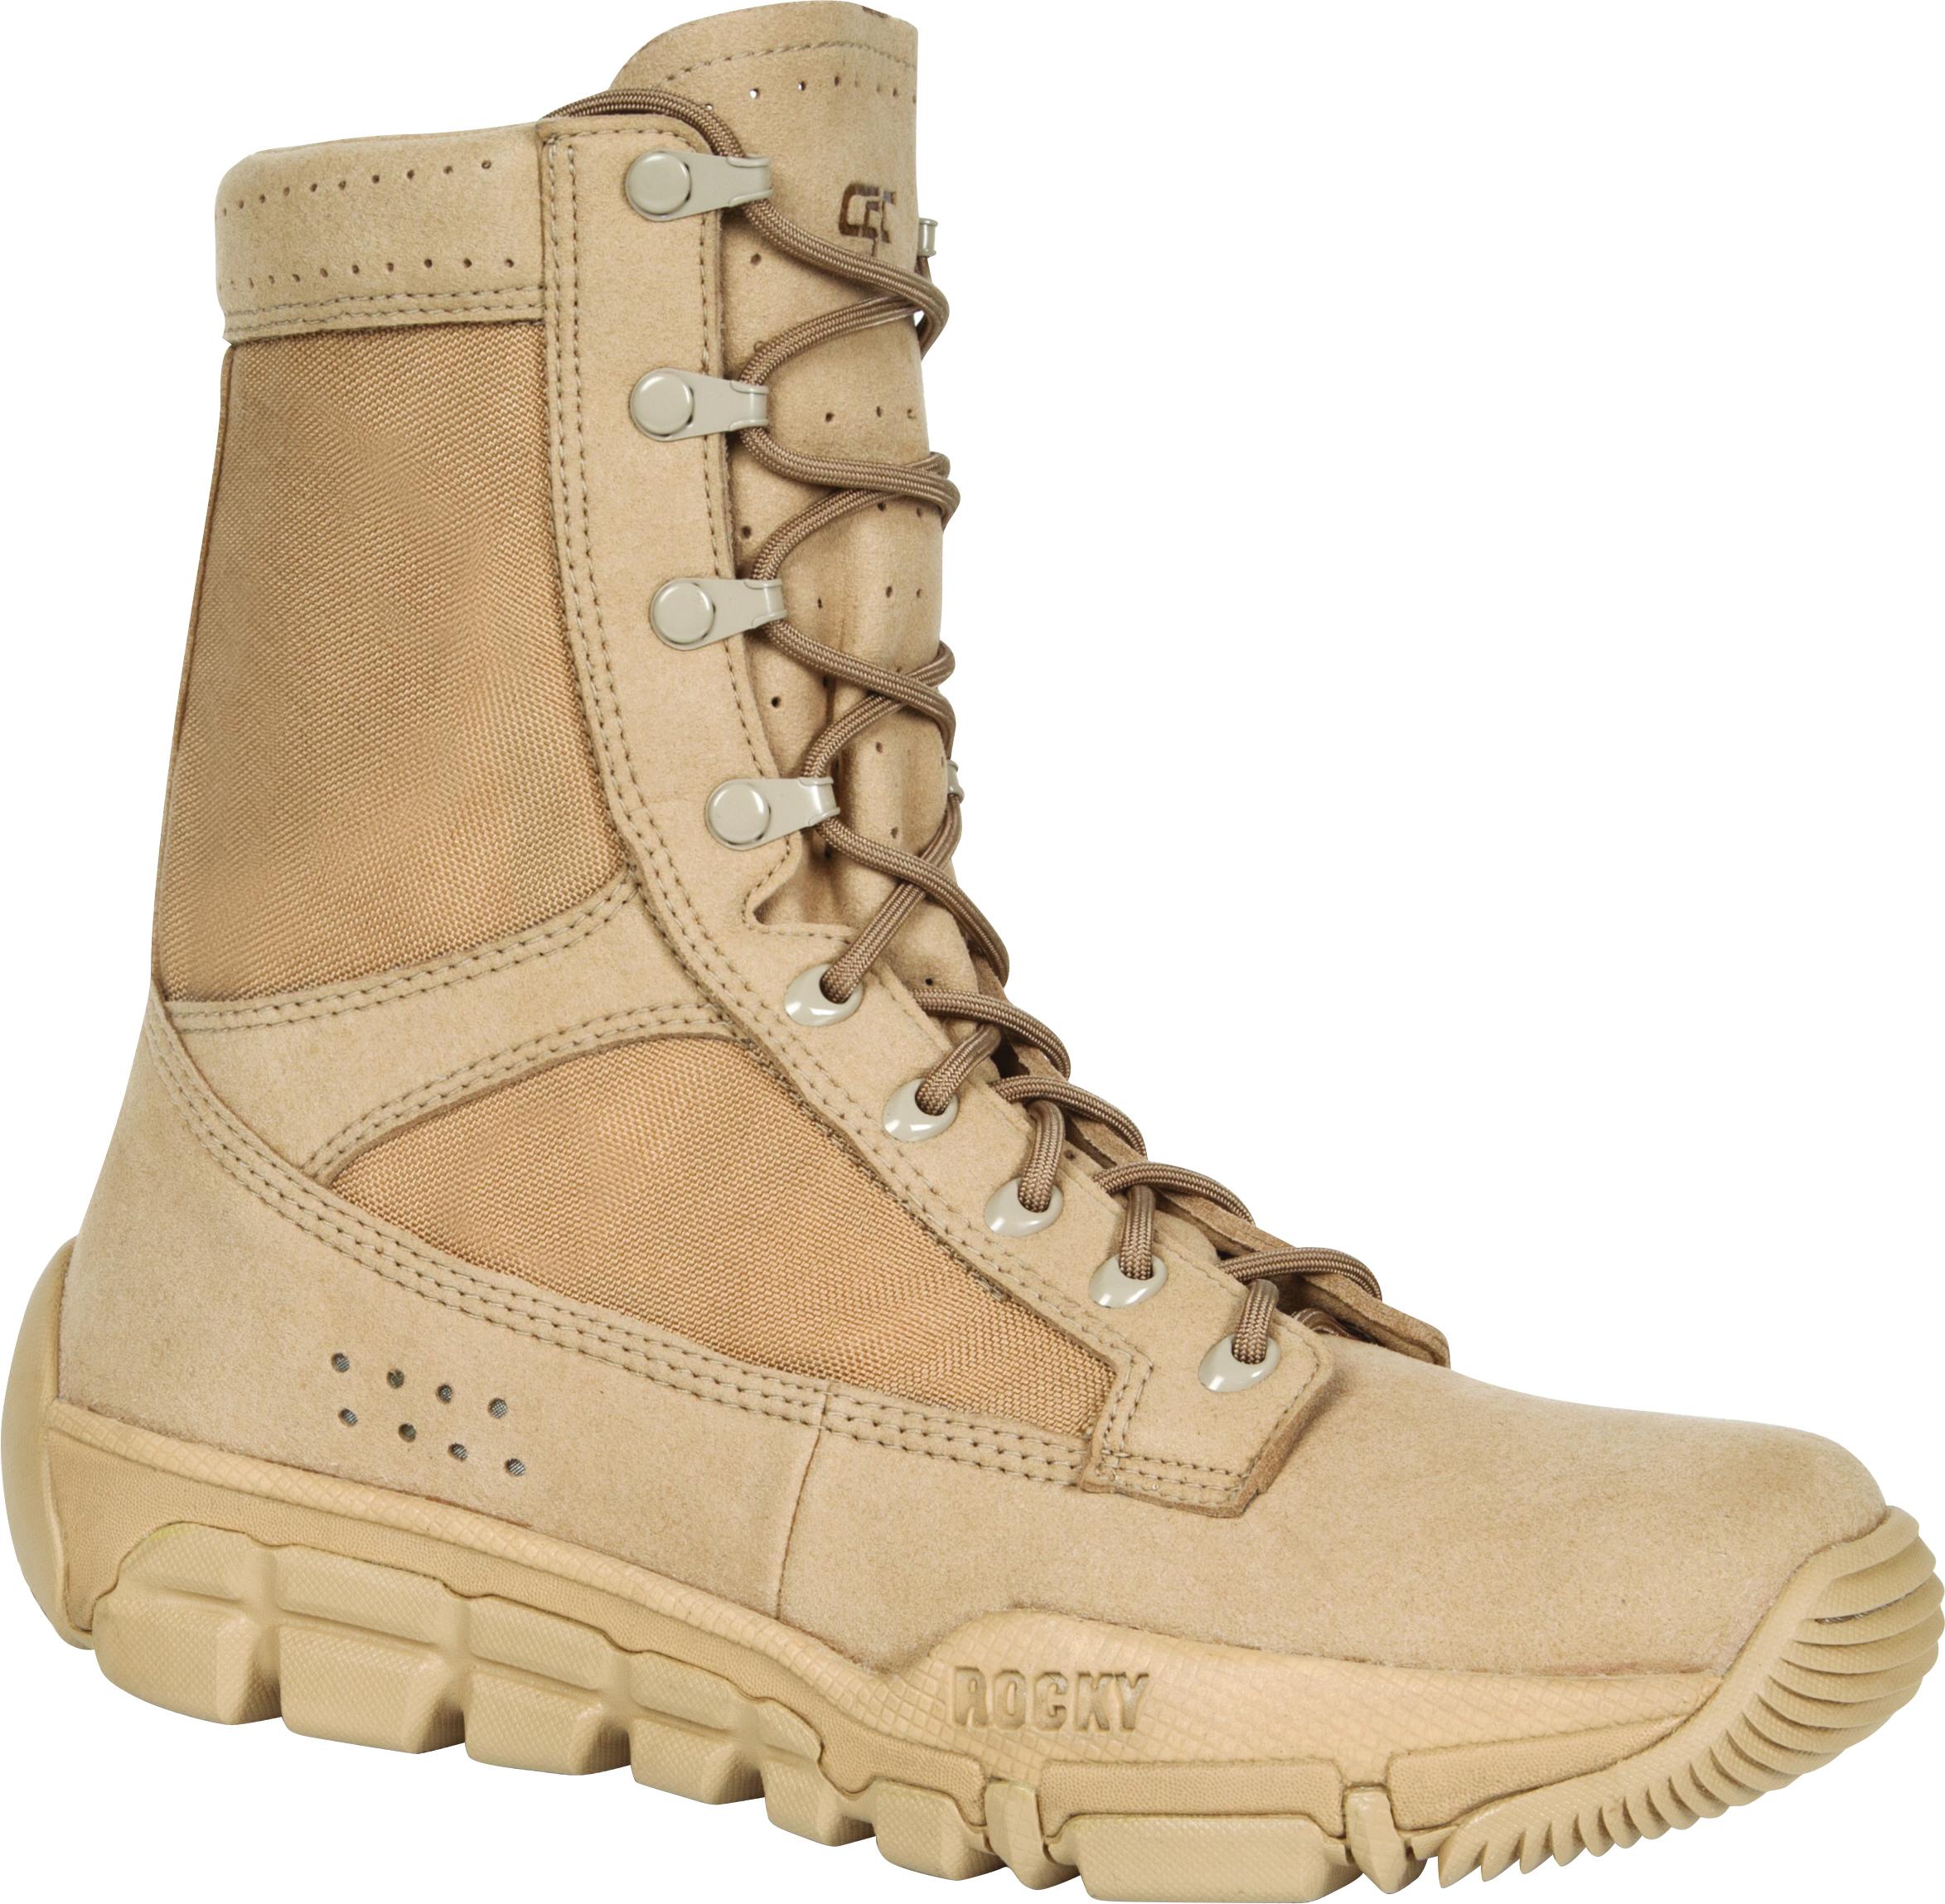 NEW C5C Rocky Army Combat Boots | DIX ENTERPRISES